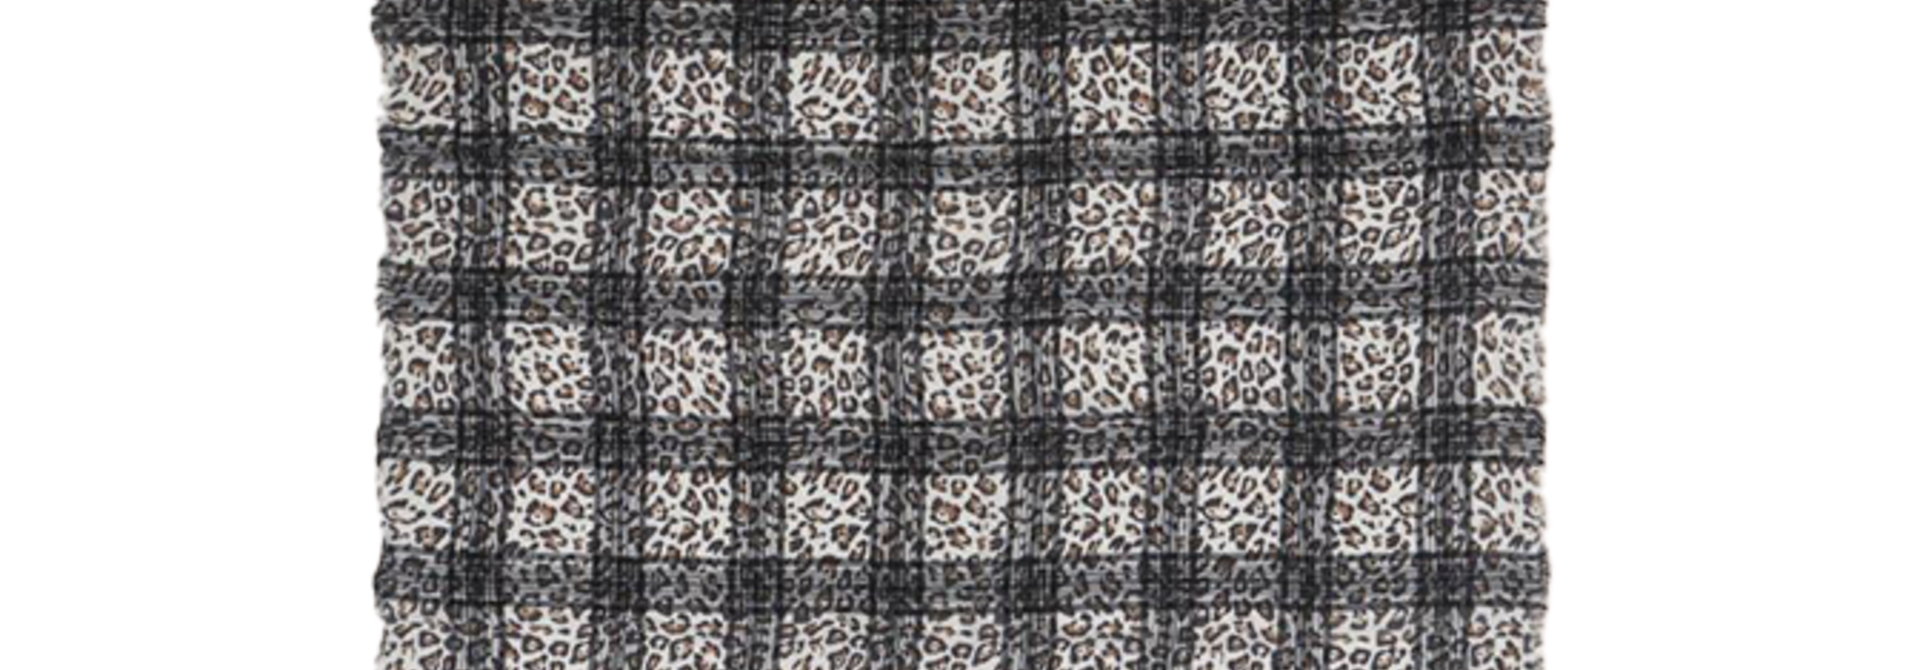 Lala Berlin 1216-AC-2006  scarf Allina